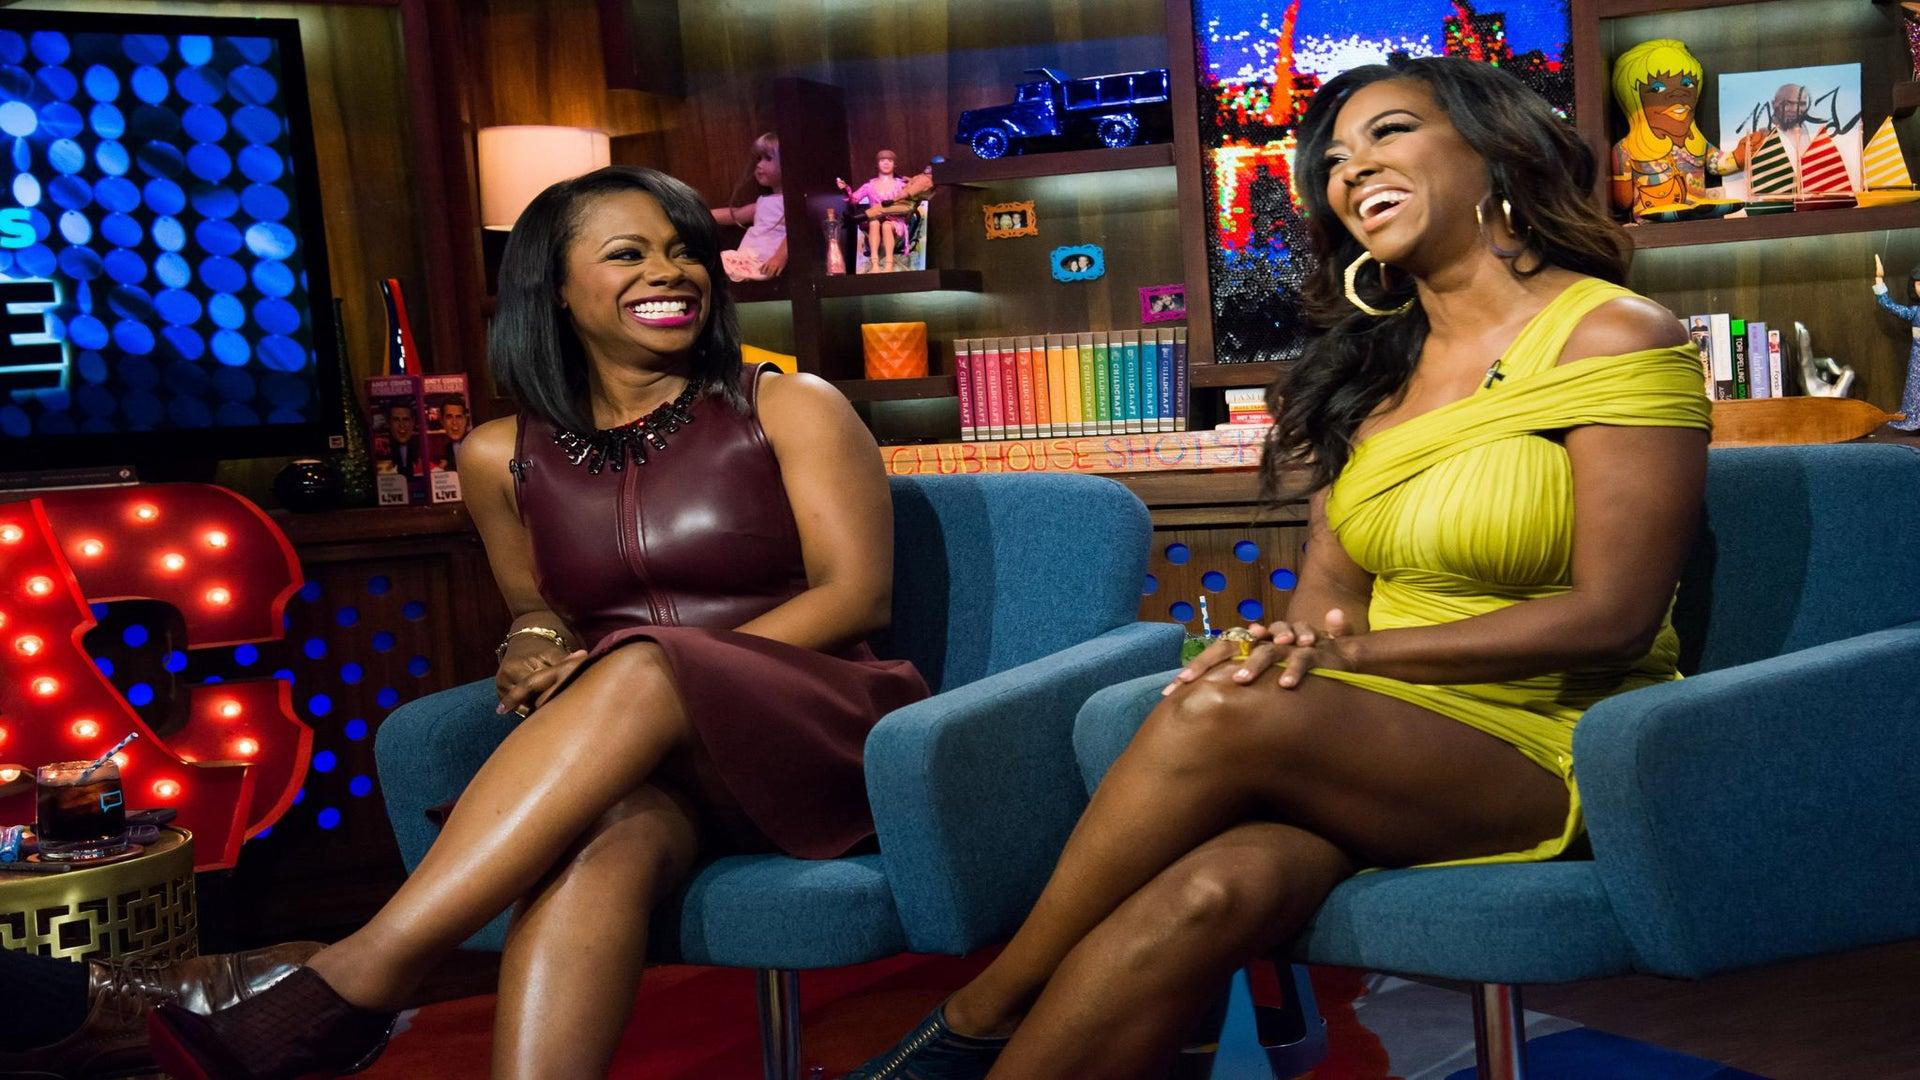 Kandi Burruss & Kenya Moore Share 7 Reasons to Catch Season 6 of RHOA